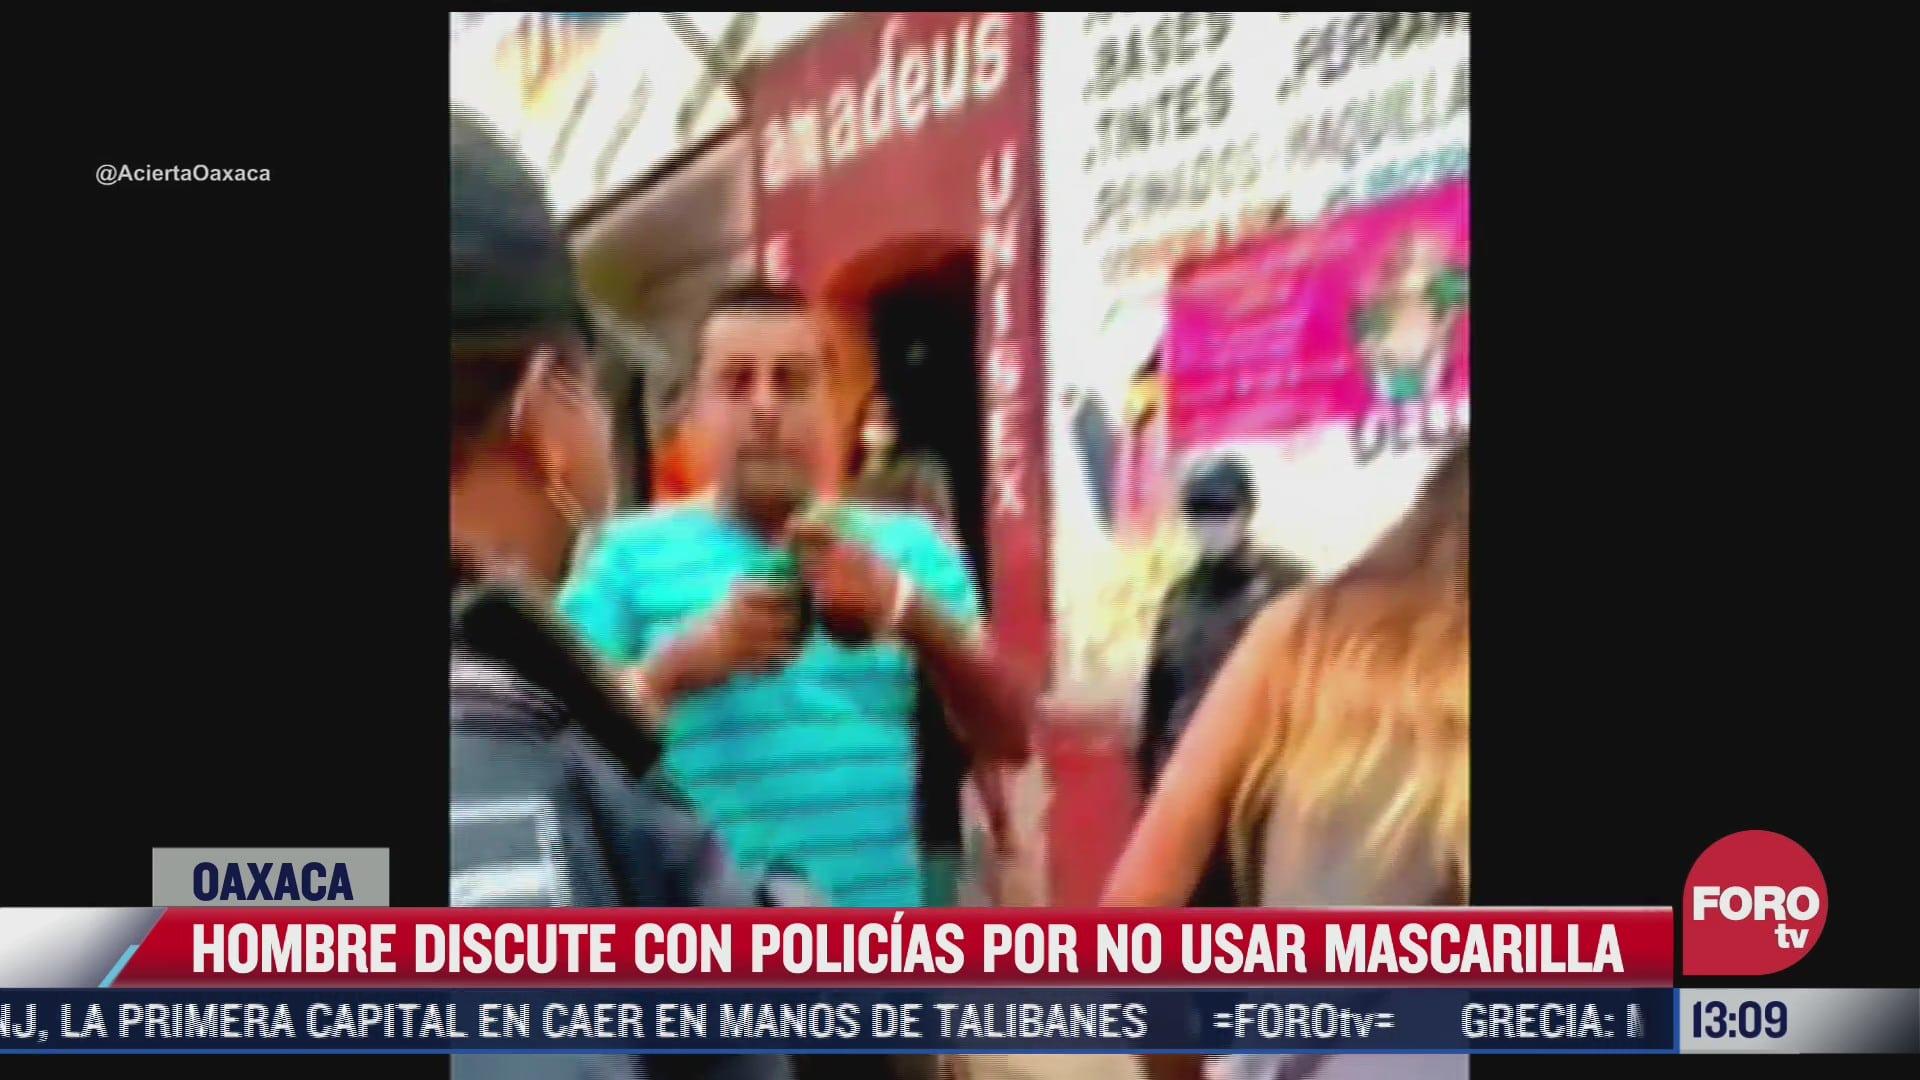 video hombre discute con policias por no usar cubrebocas